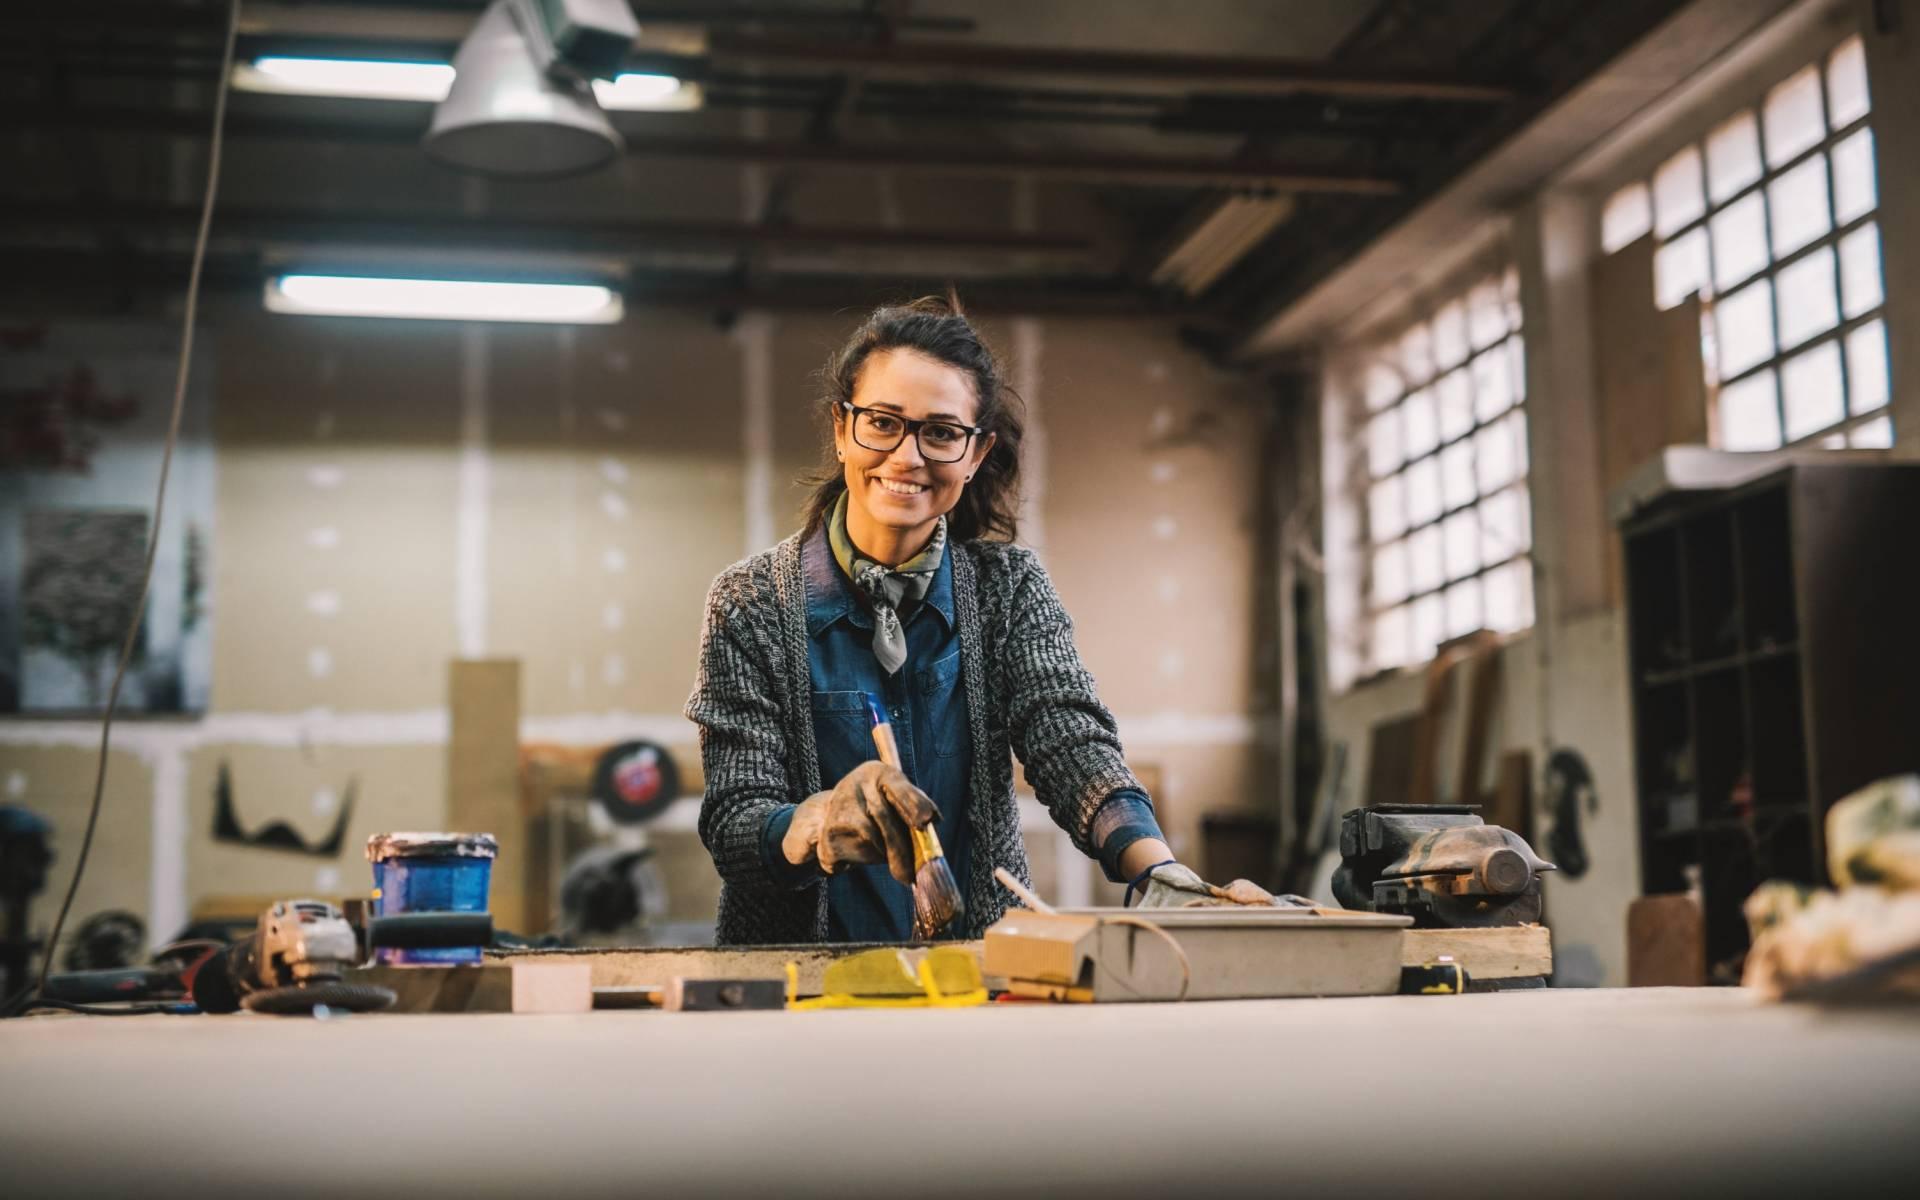 Woman in workshop